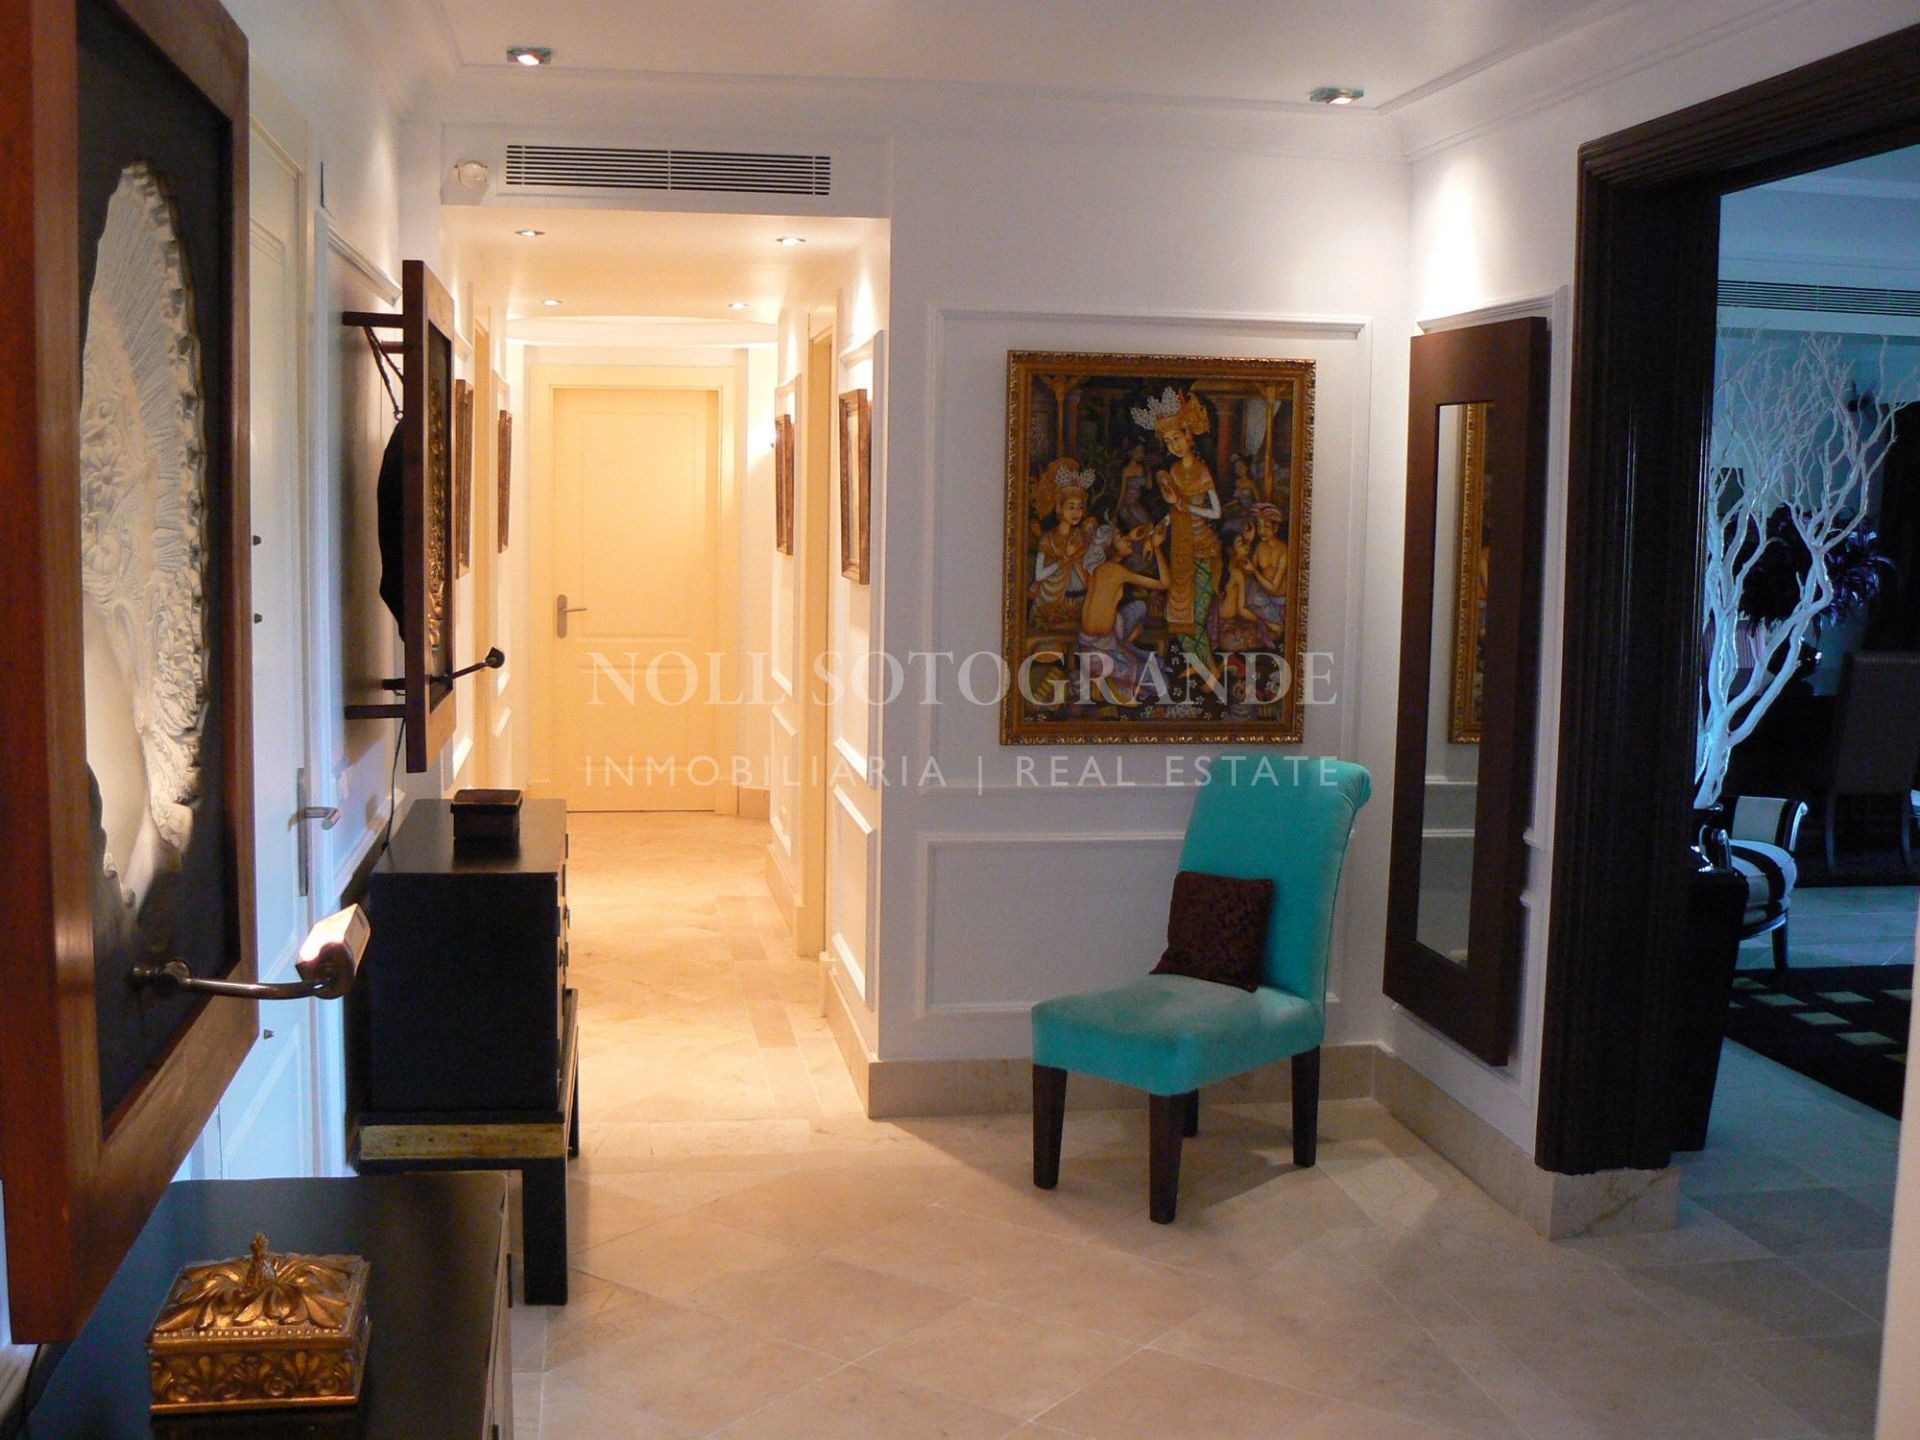 Spacious Apartment in the urbanisation Valgrande, Sotogrande for rent